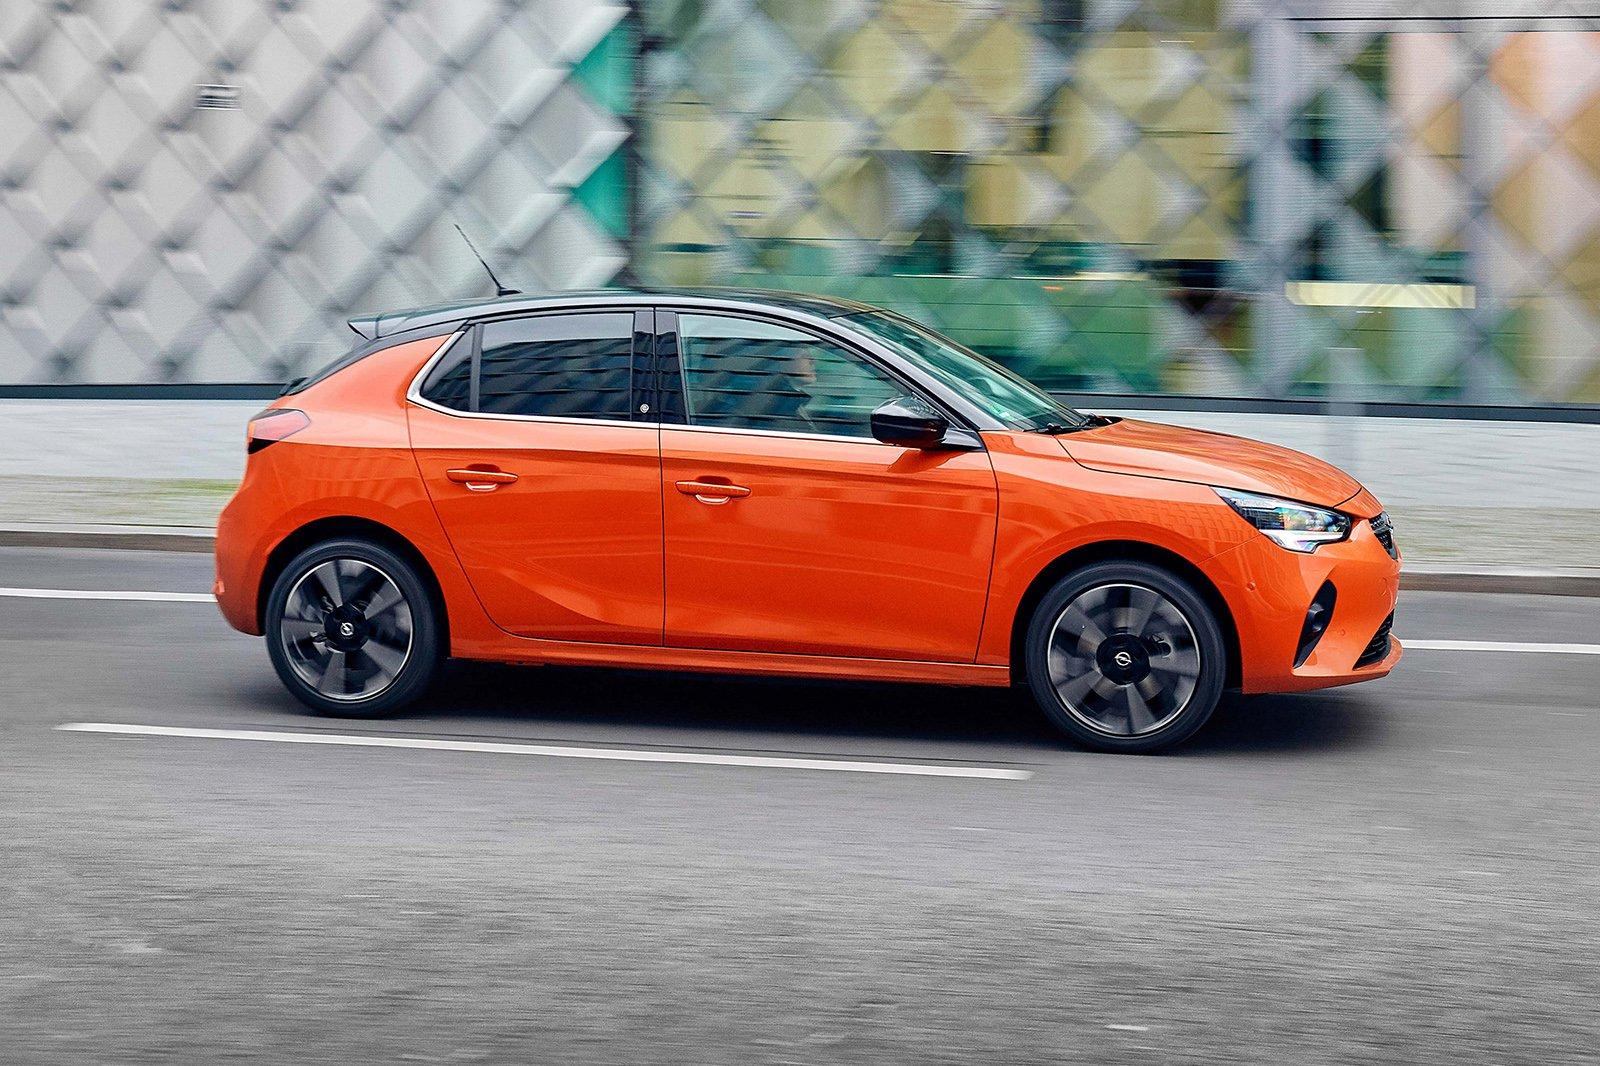 Vauxhall Corsa-e 2020 LHD right panning